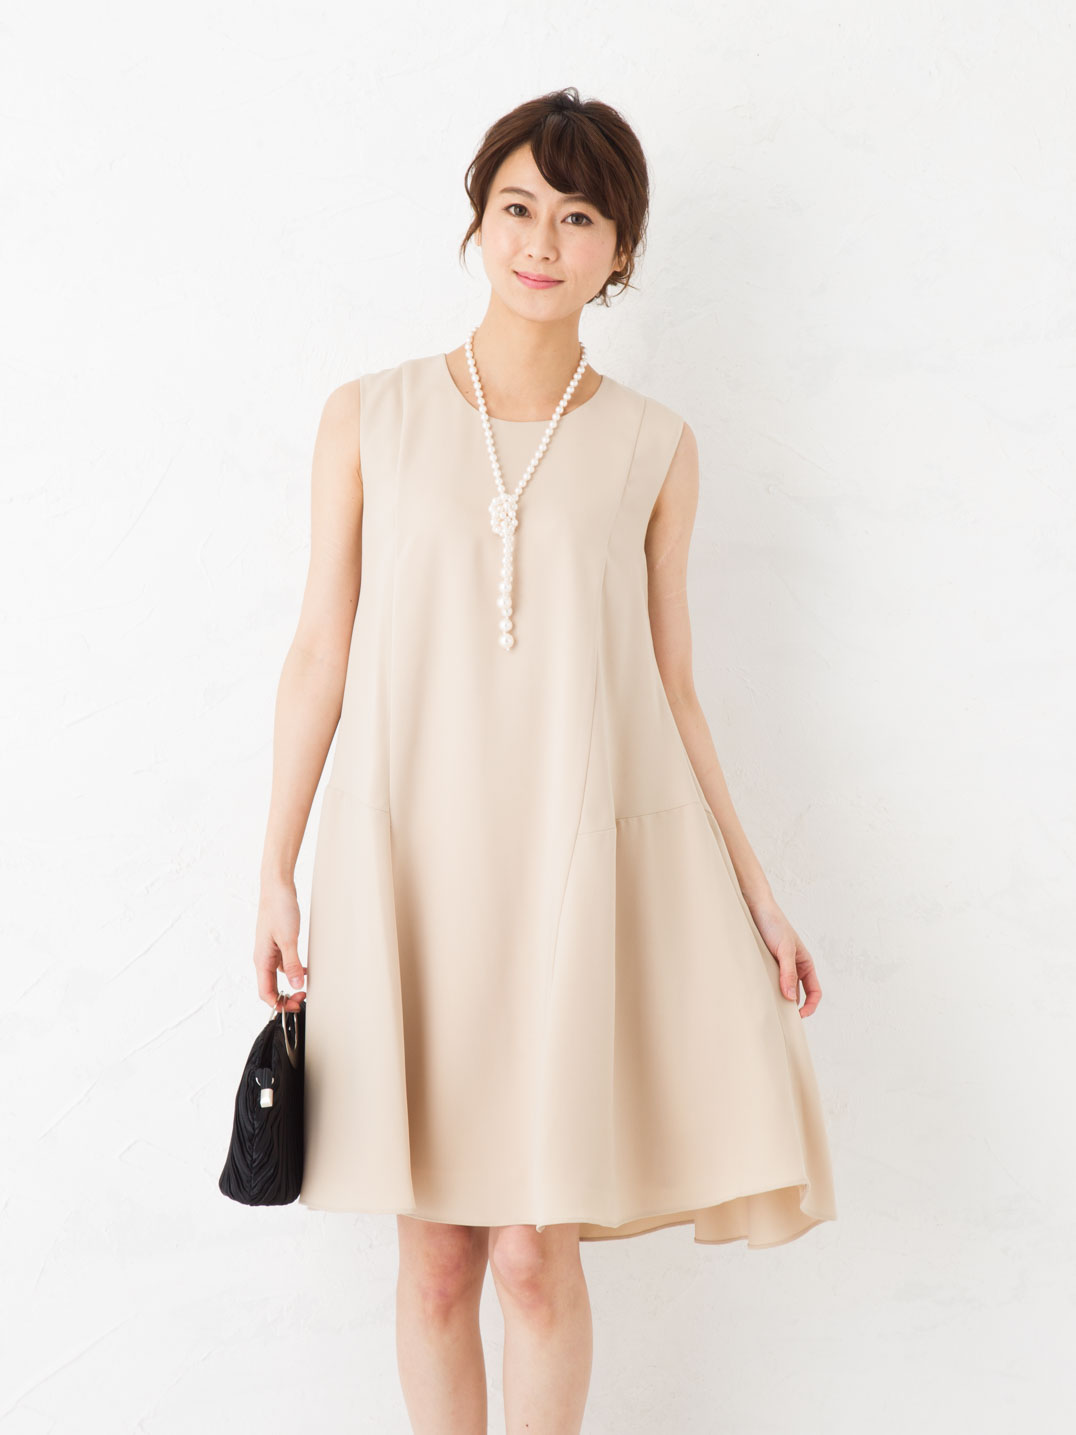 RYK ドレス / Mサイズ (DOC0089)